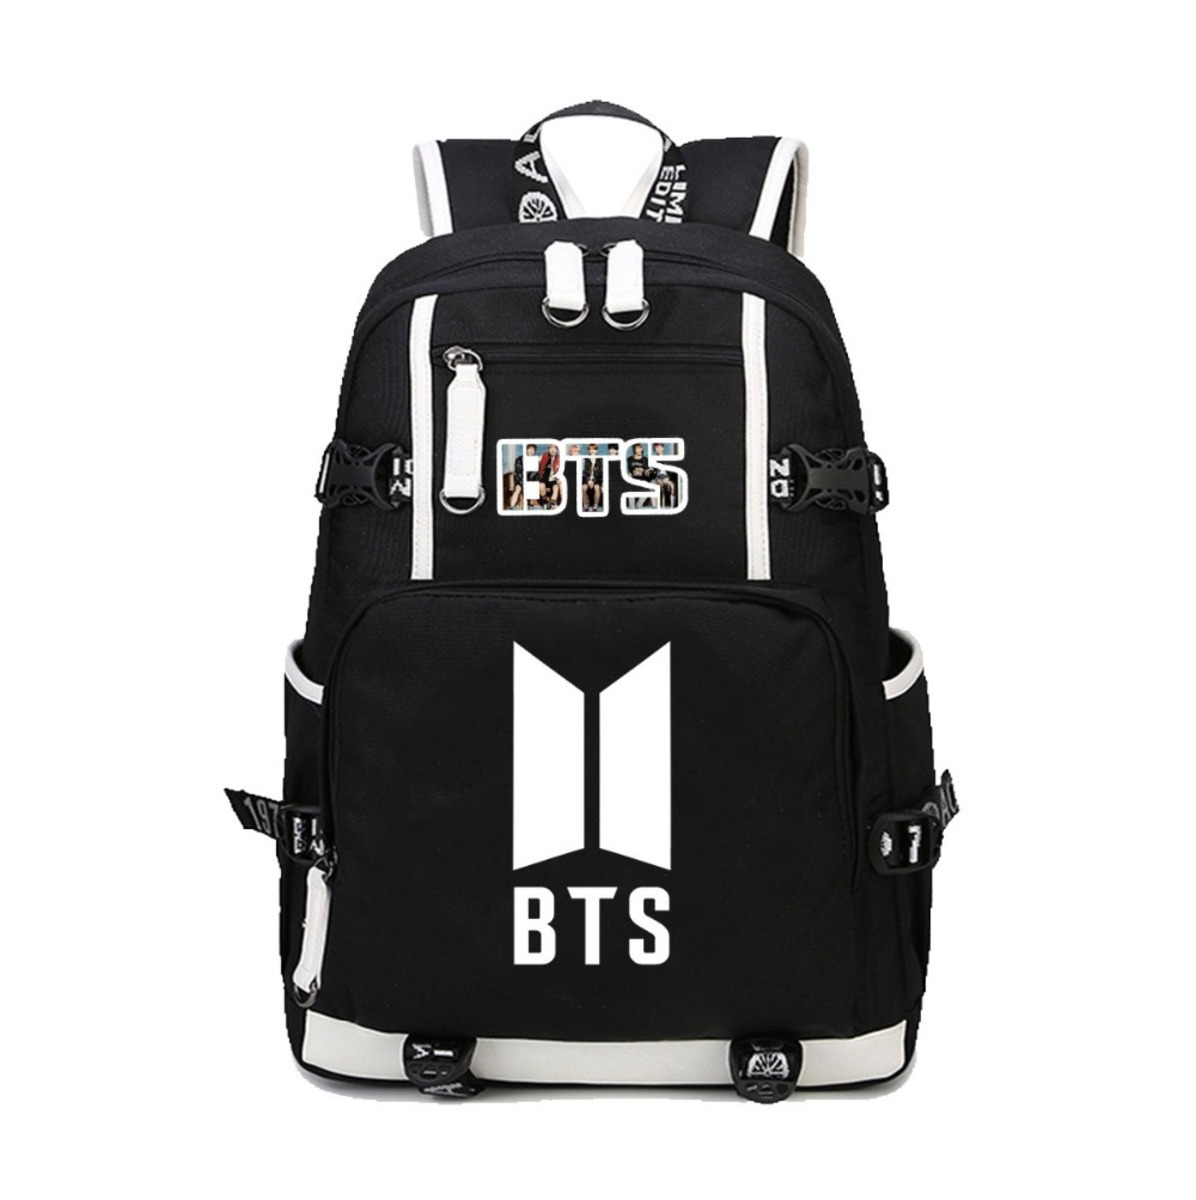 все цены на BTS Bangtan Boys canvas Backpack Large Capacity Travelling Bag Fans student book backpack men women Laptop Rucksack 7 style онлайн